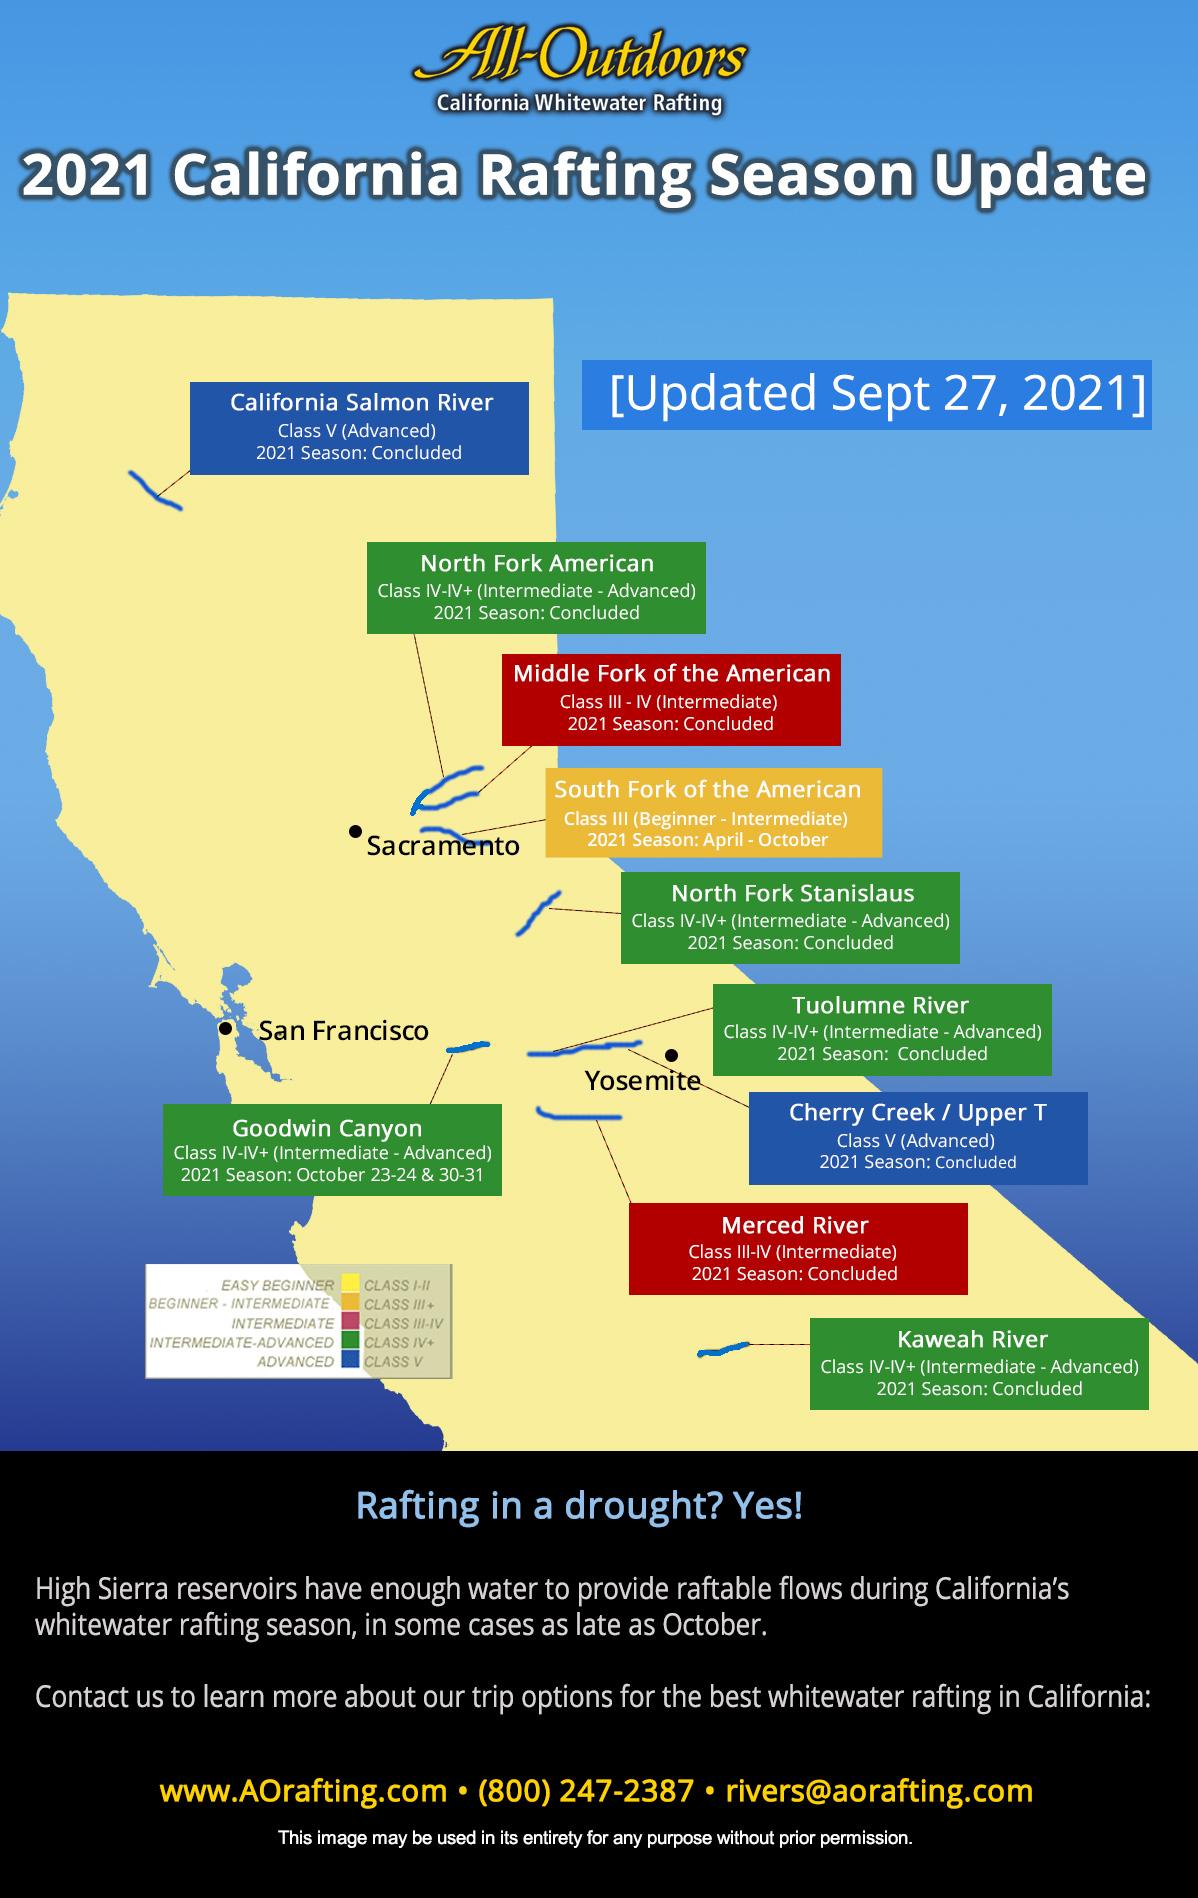 California Rafting Update - September 2021